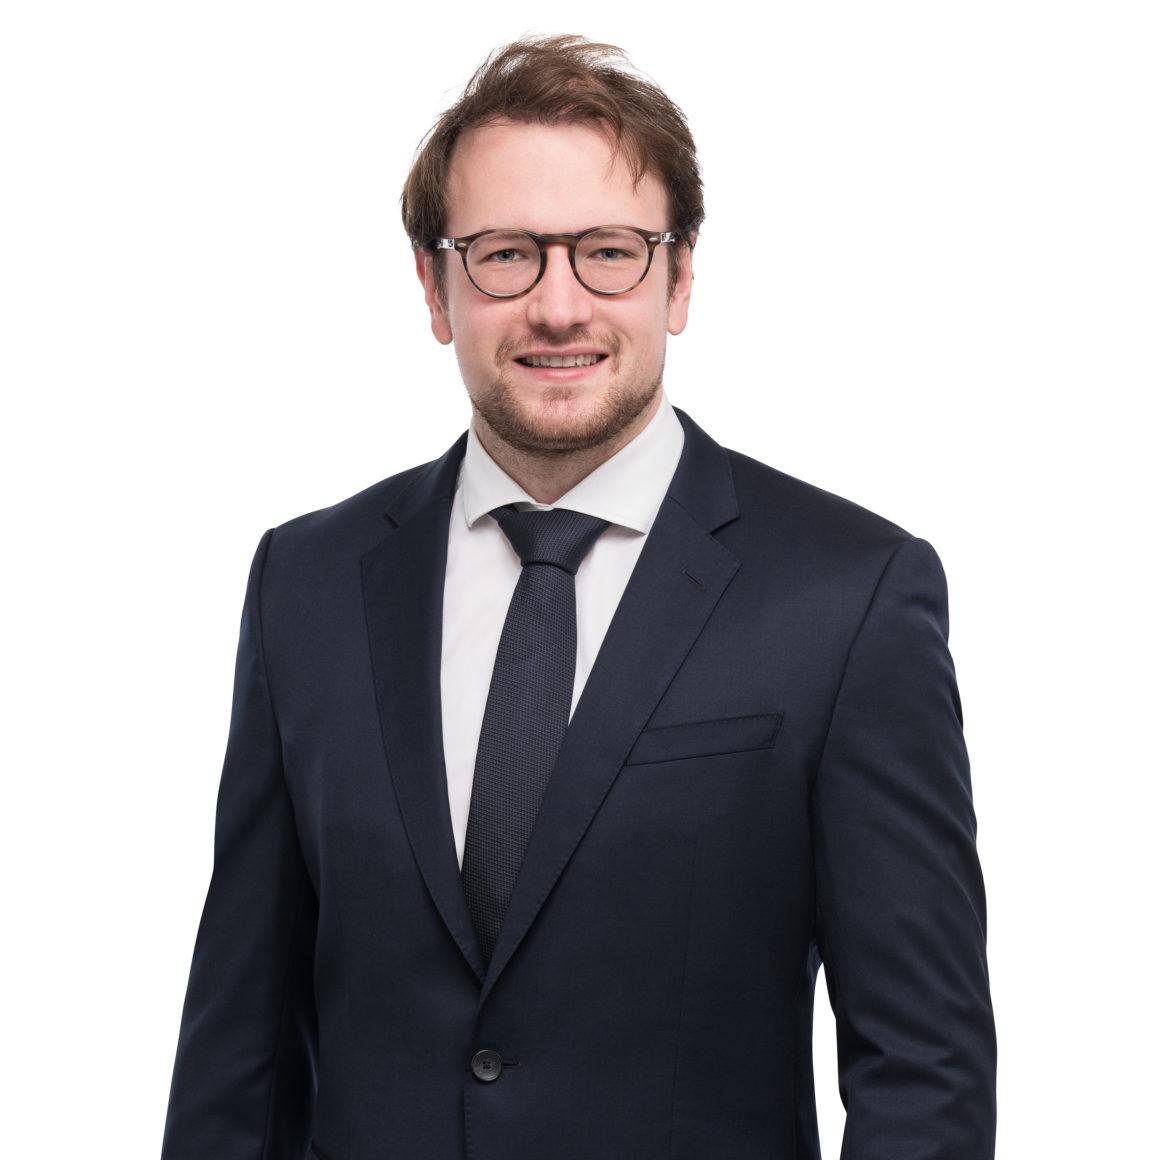 Maxime Junak